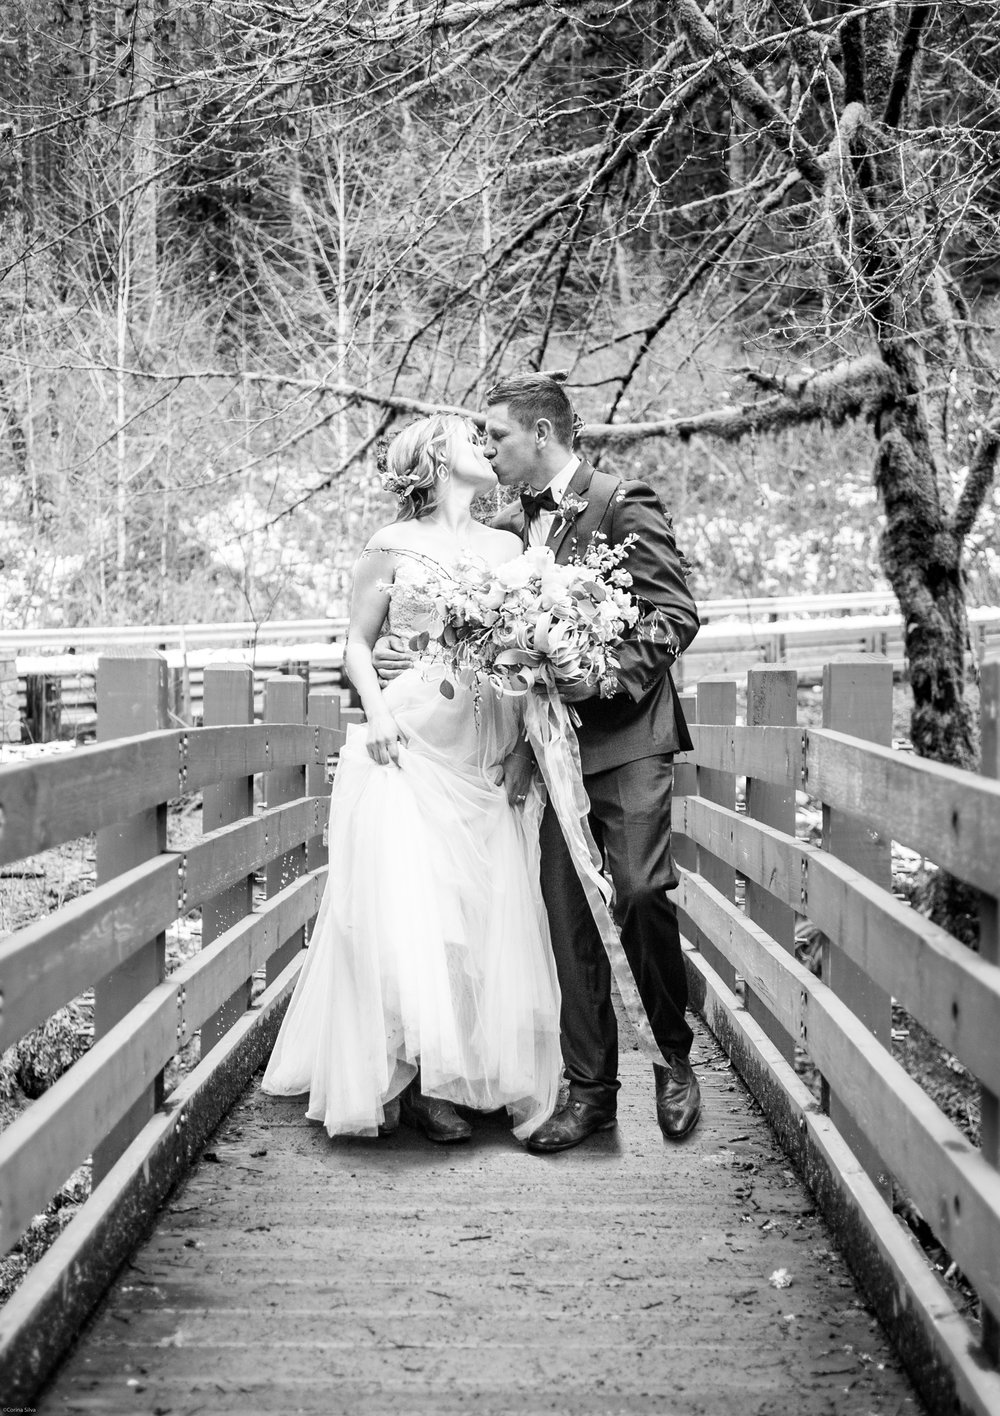 Silver Falls-elopement-bride-and-groom-photo Corina Silva Studios-277.jpg